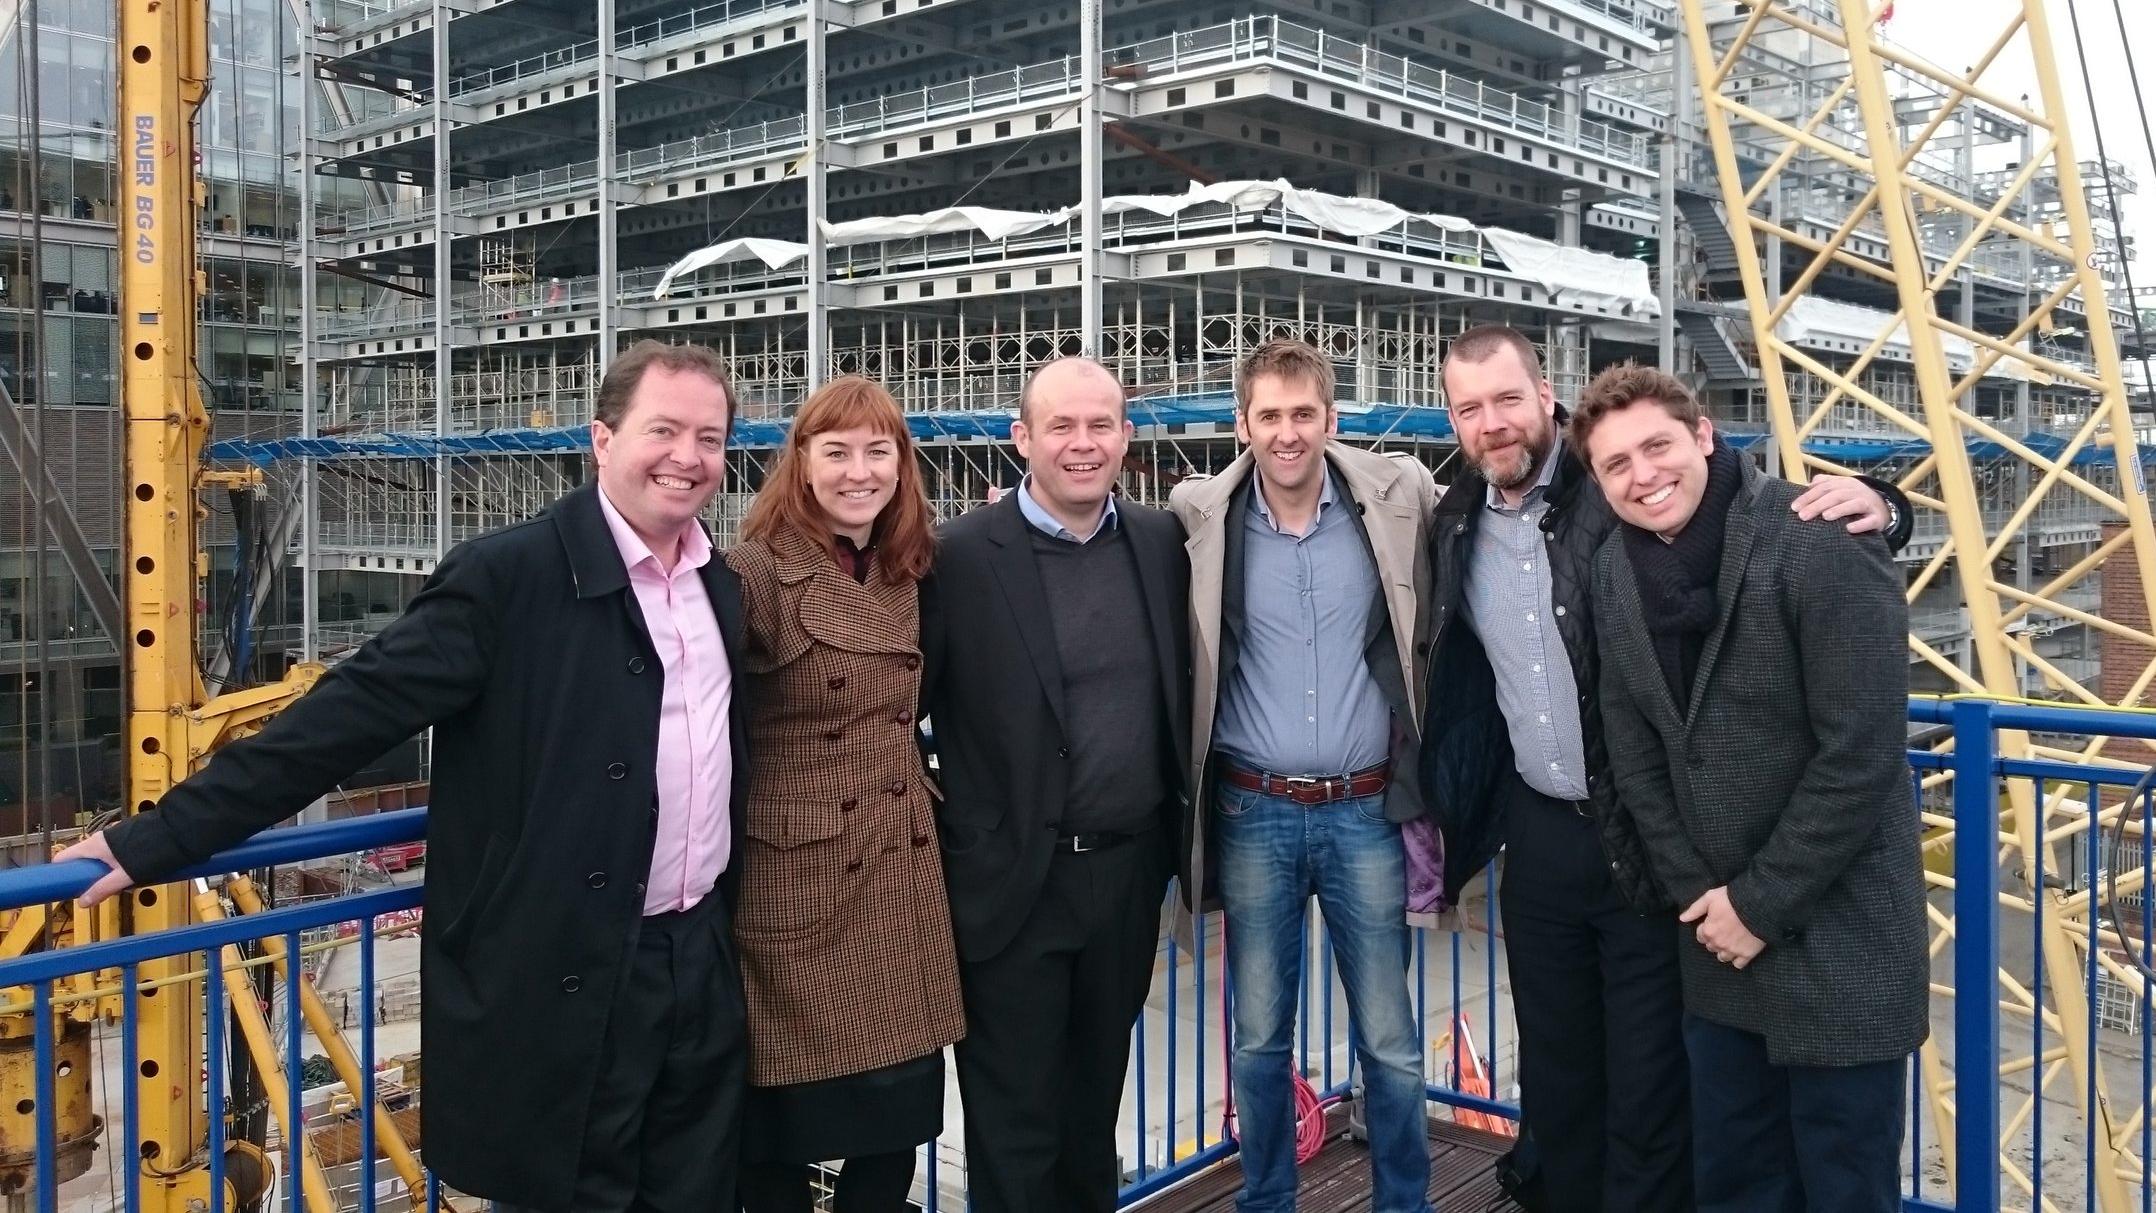 establishing Tech CITY - Client: London Borough of Hackney